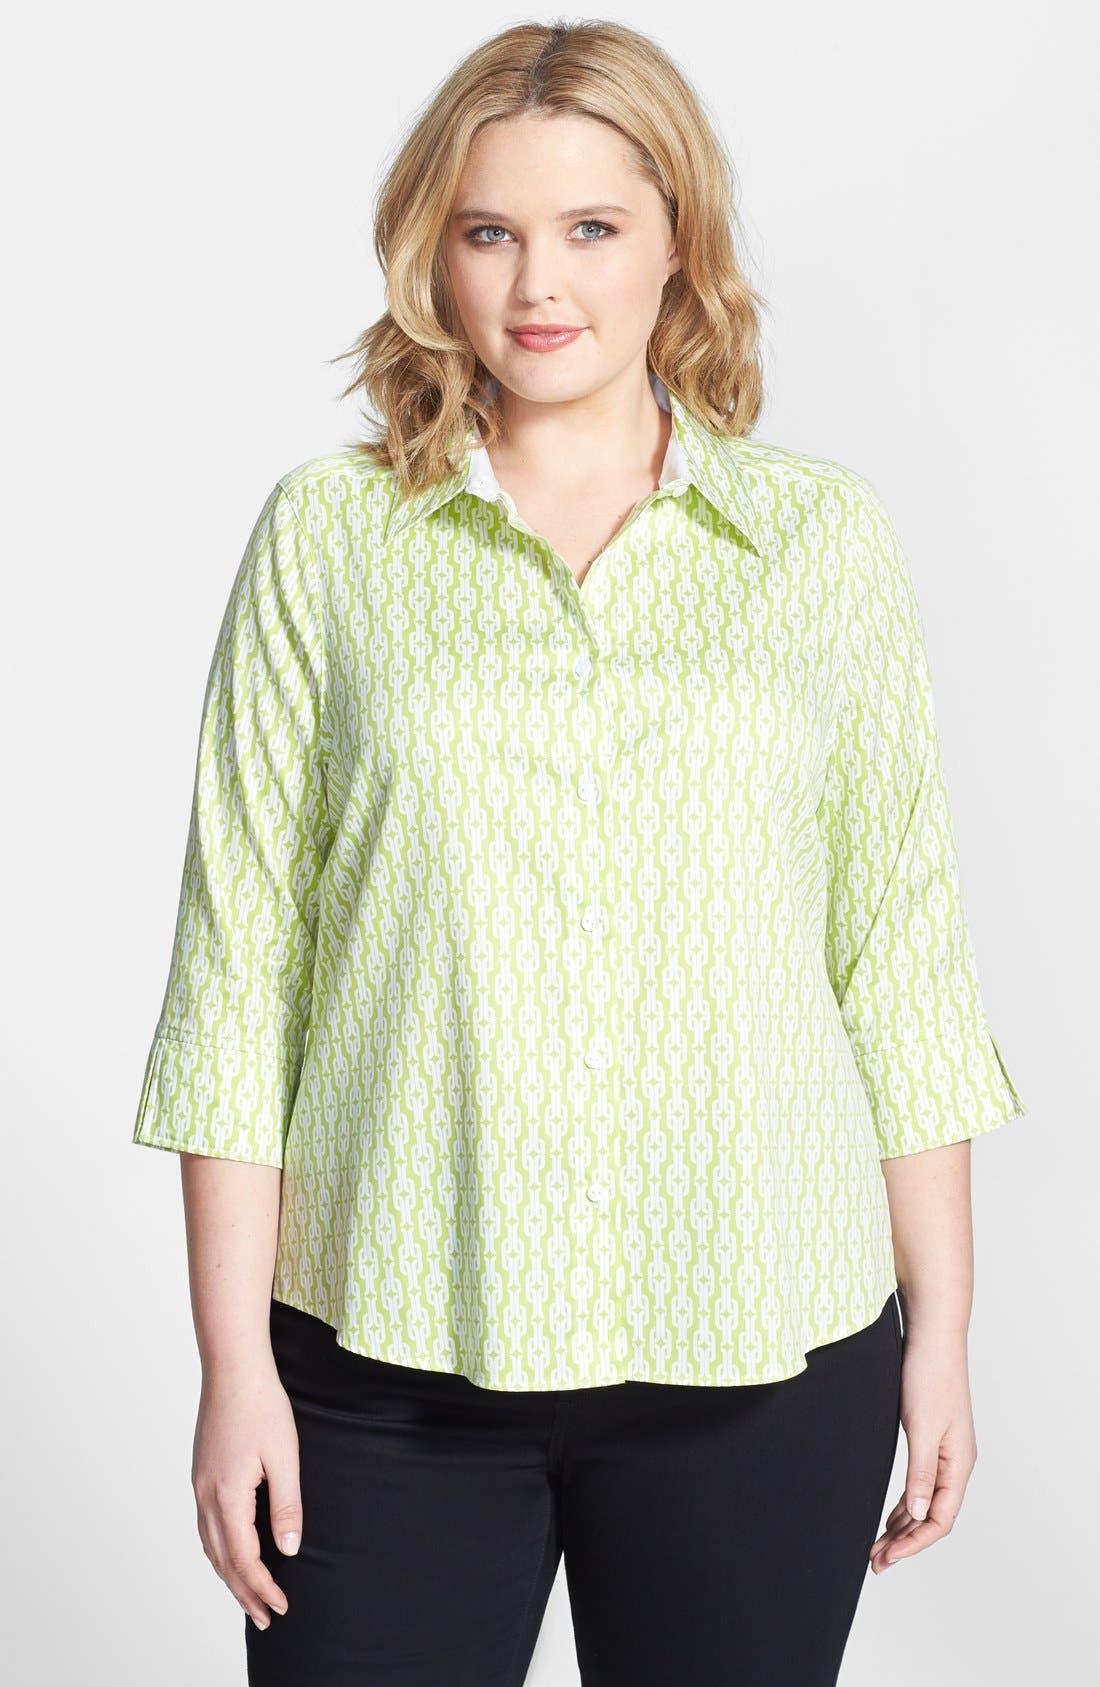 Main Image - Foxcroft Chain Link Print Shaped Non-Iron Cotton Shirt (Plus Size)